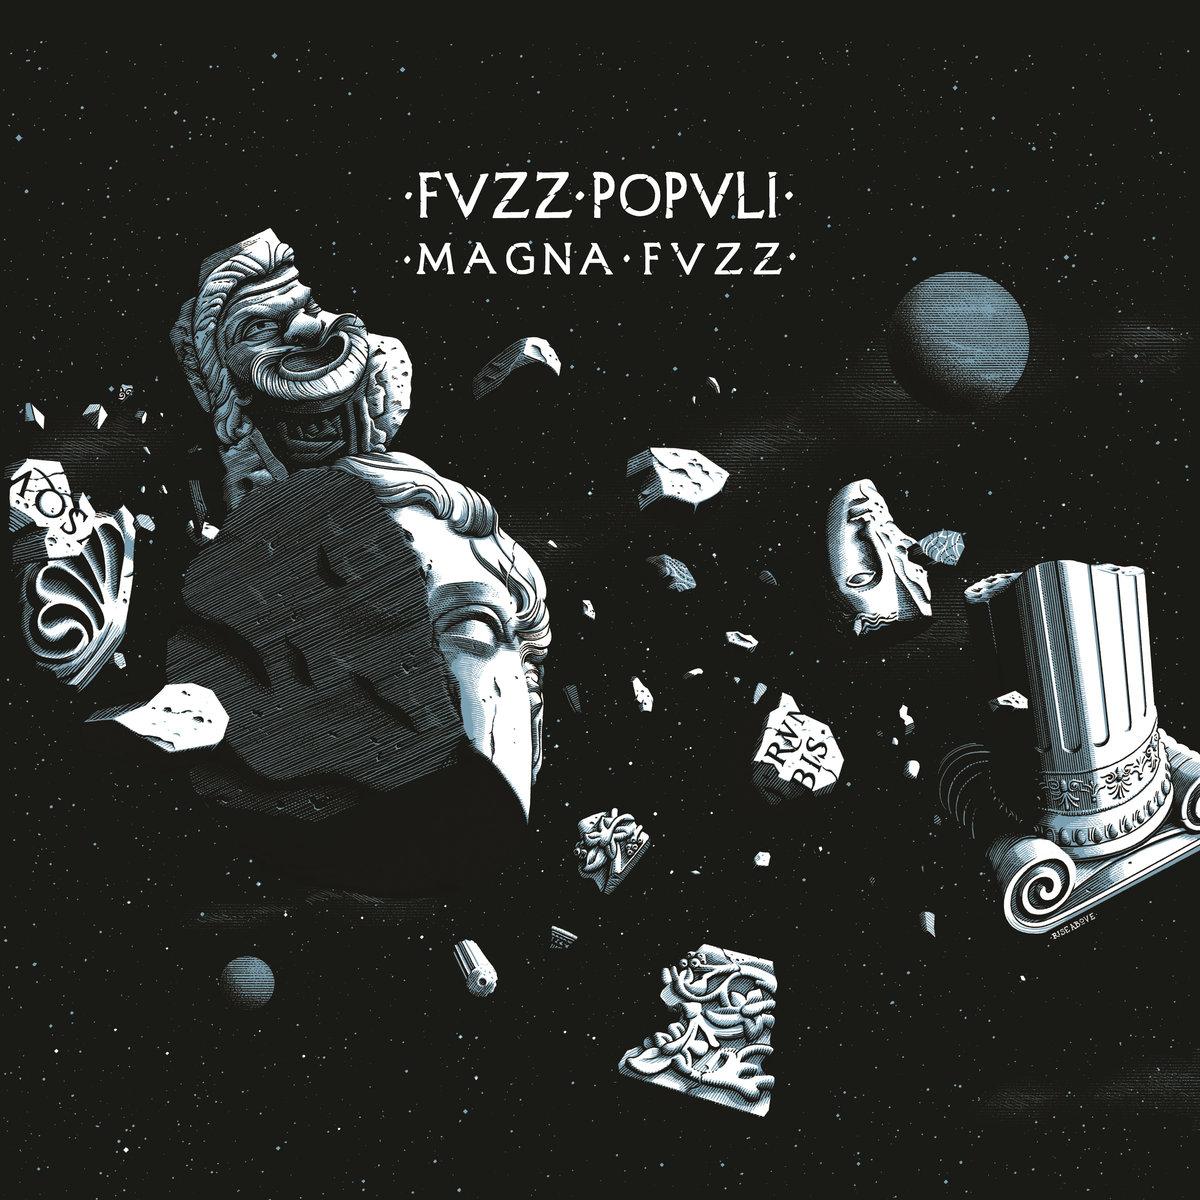 Fvzz Popvli - Magna Fvzz